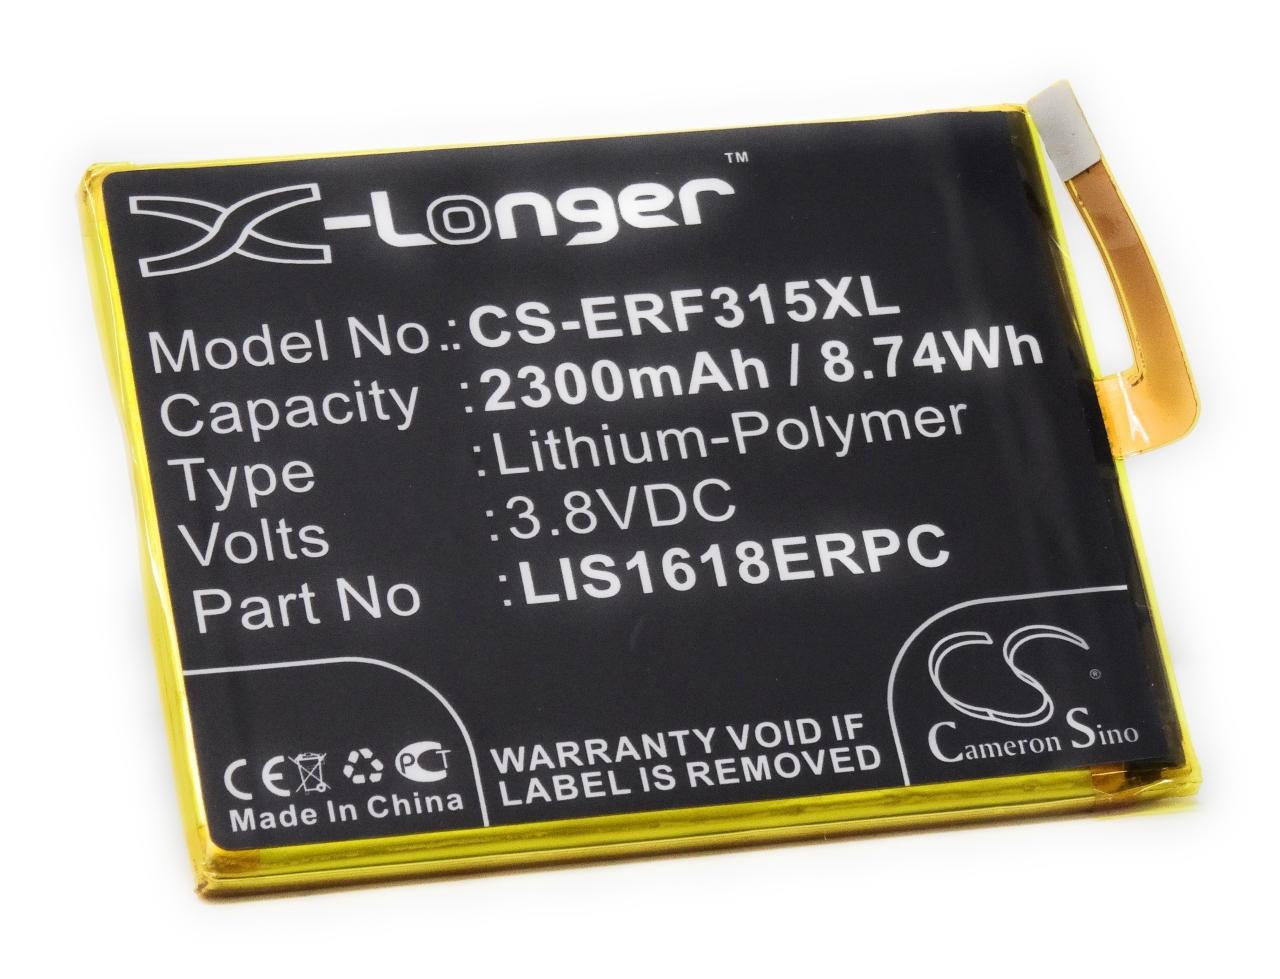 Acumulator compatibil Sony model 1298-9239